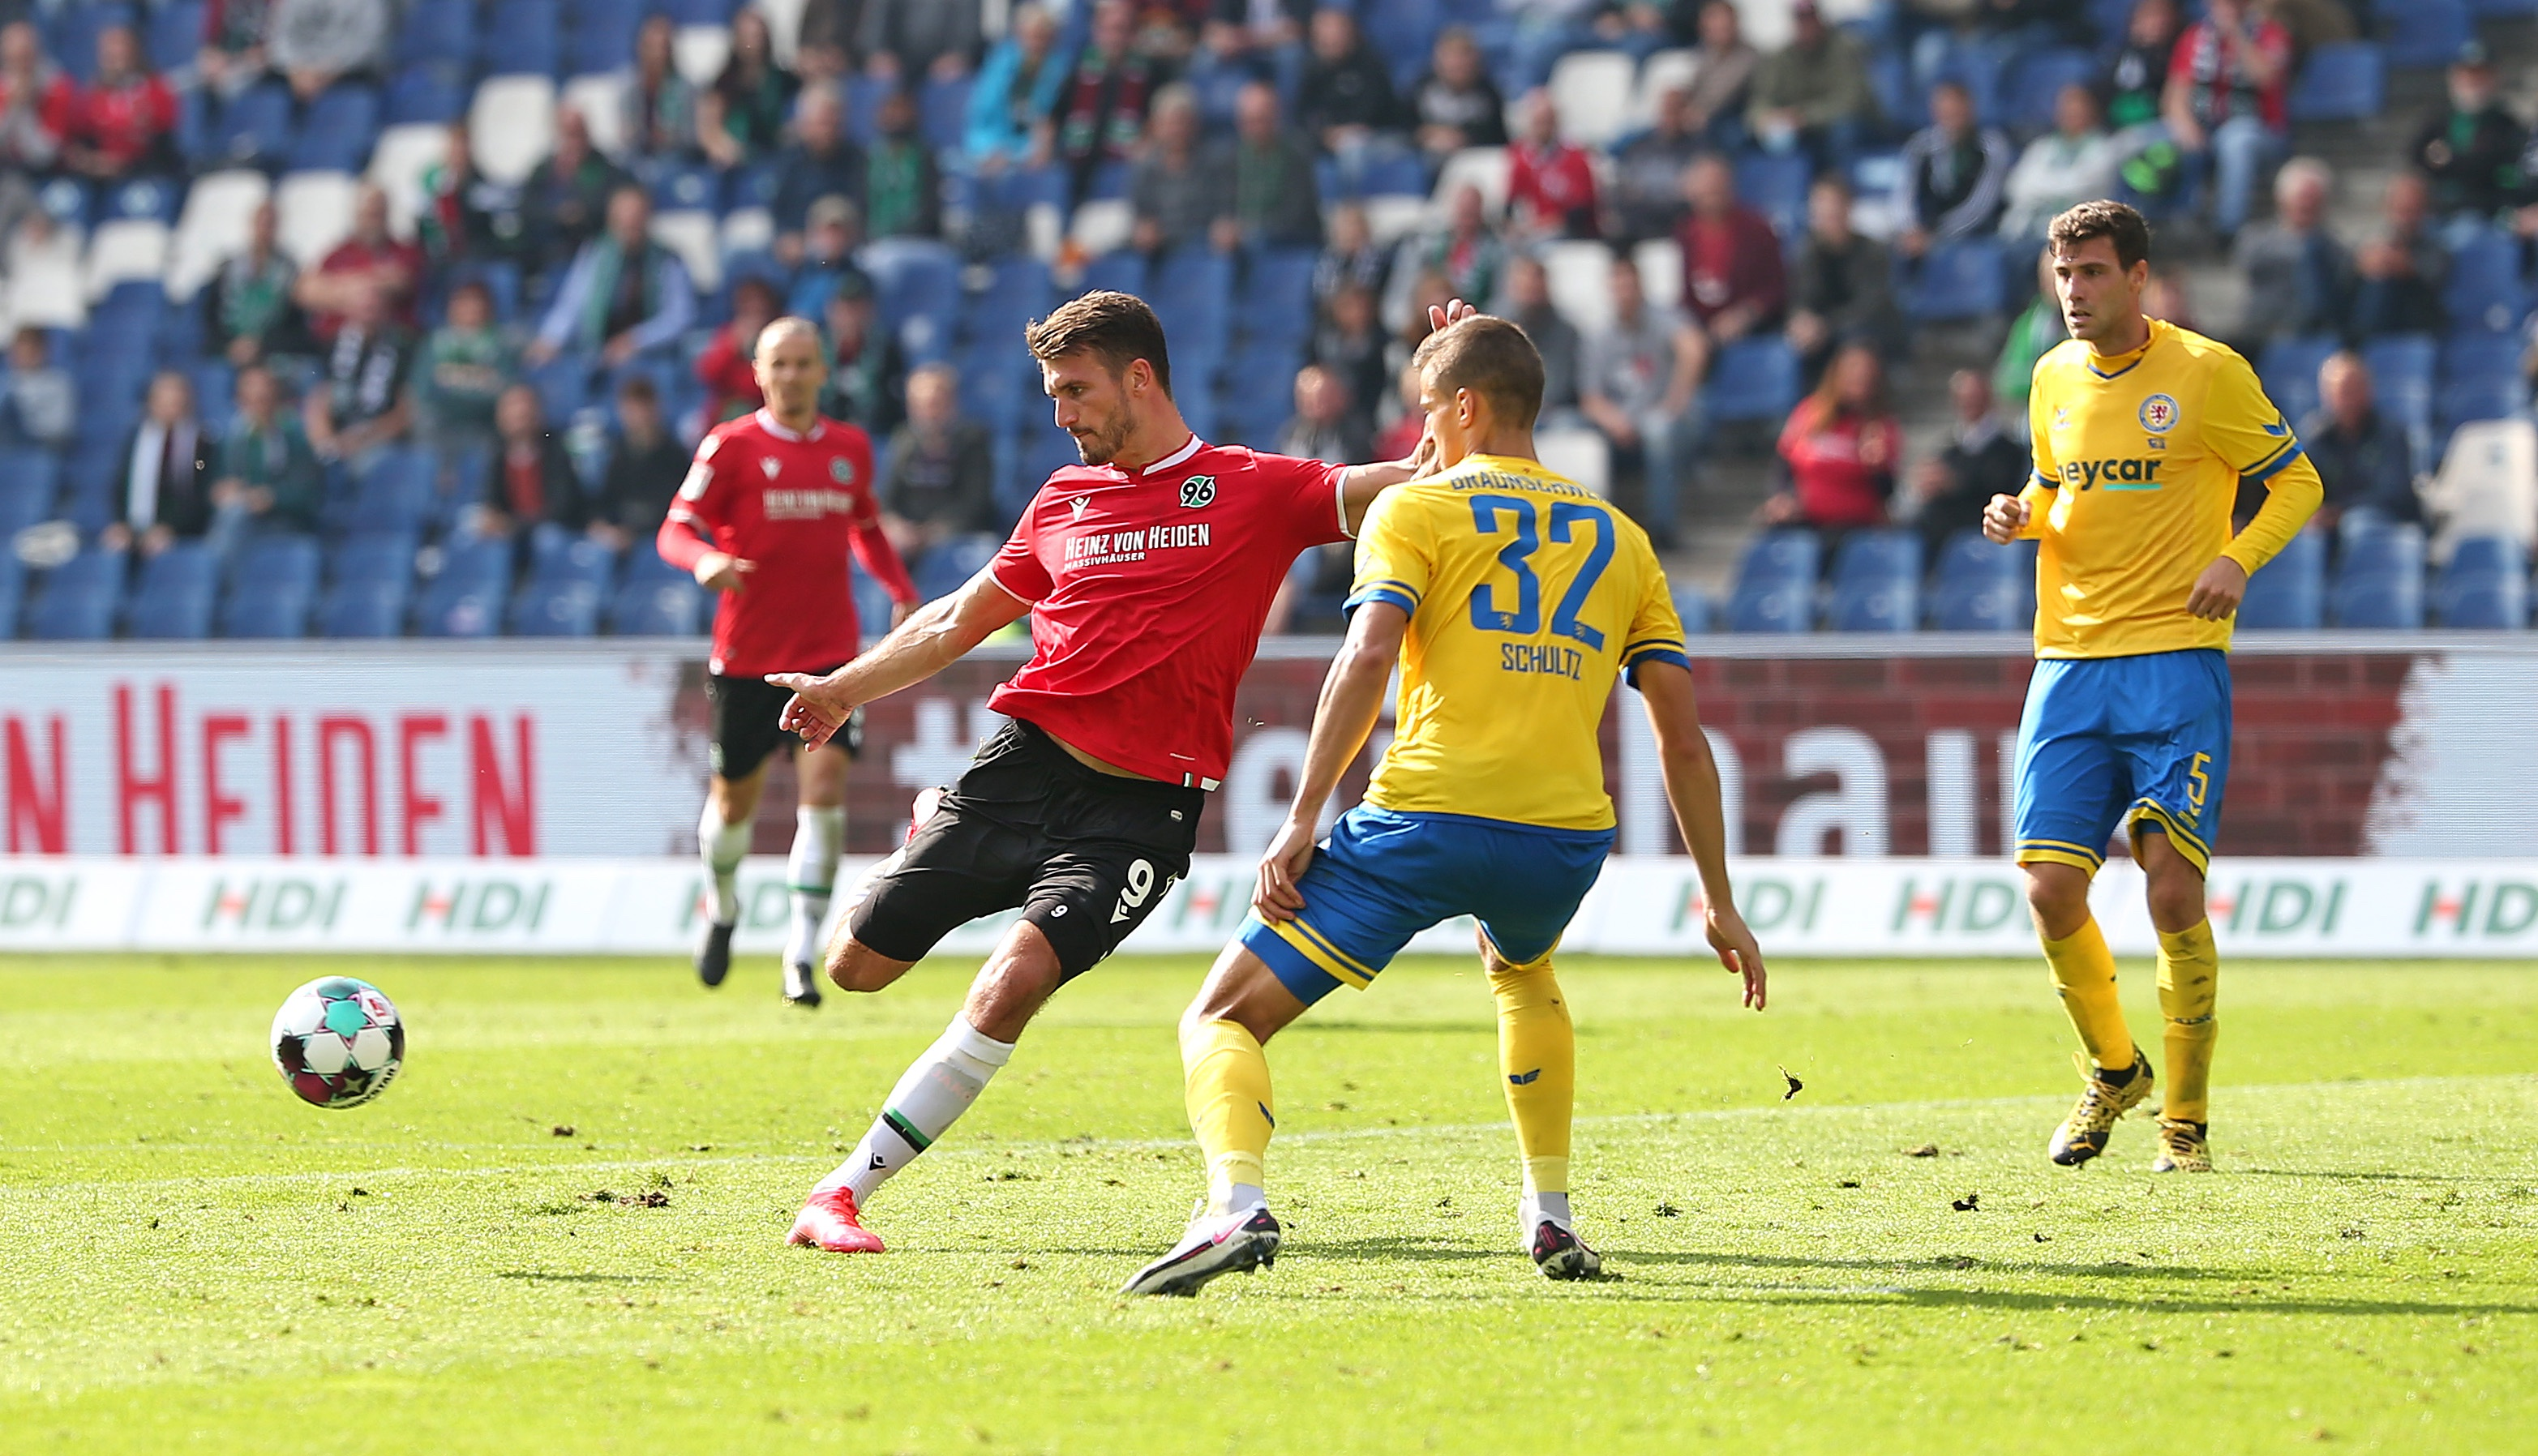 Hannover 96 v Eintracht Braunschweig – Second Bundesliga